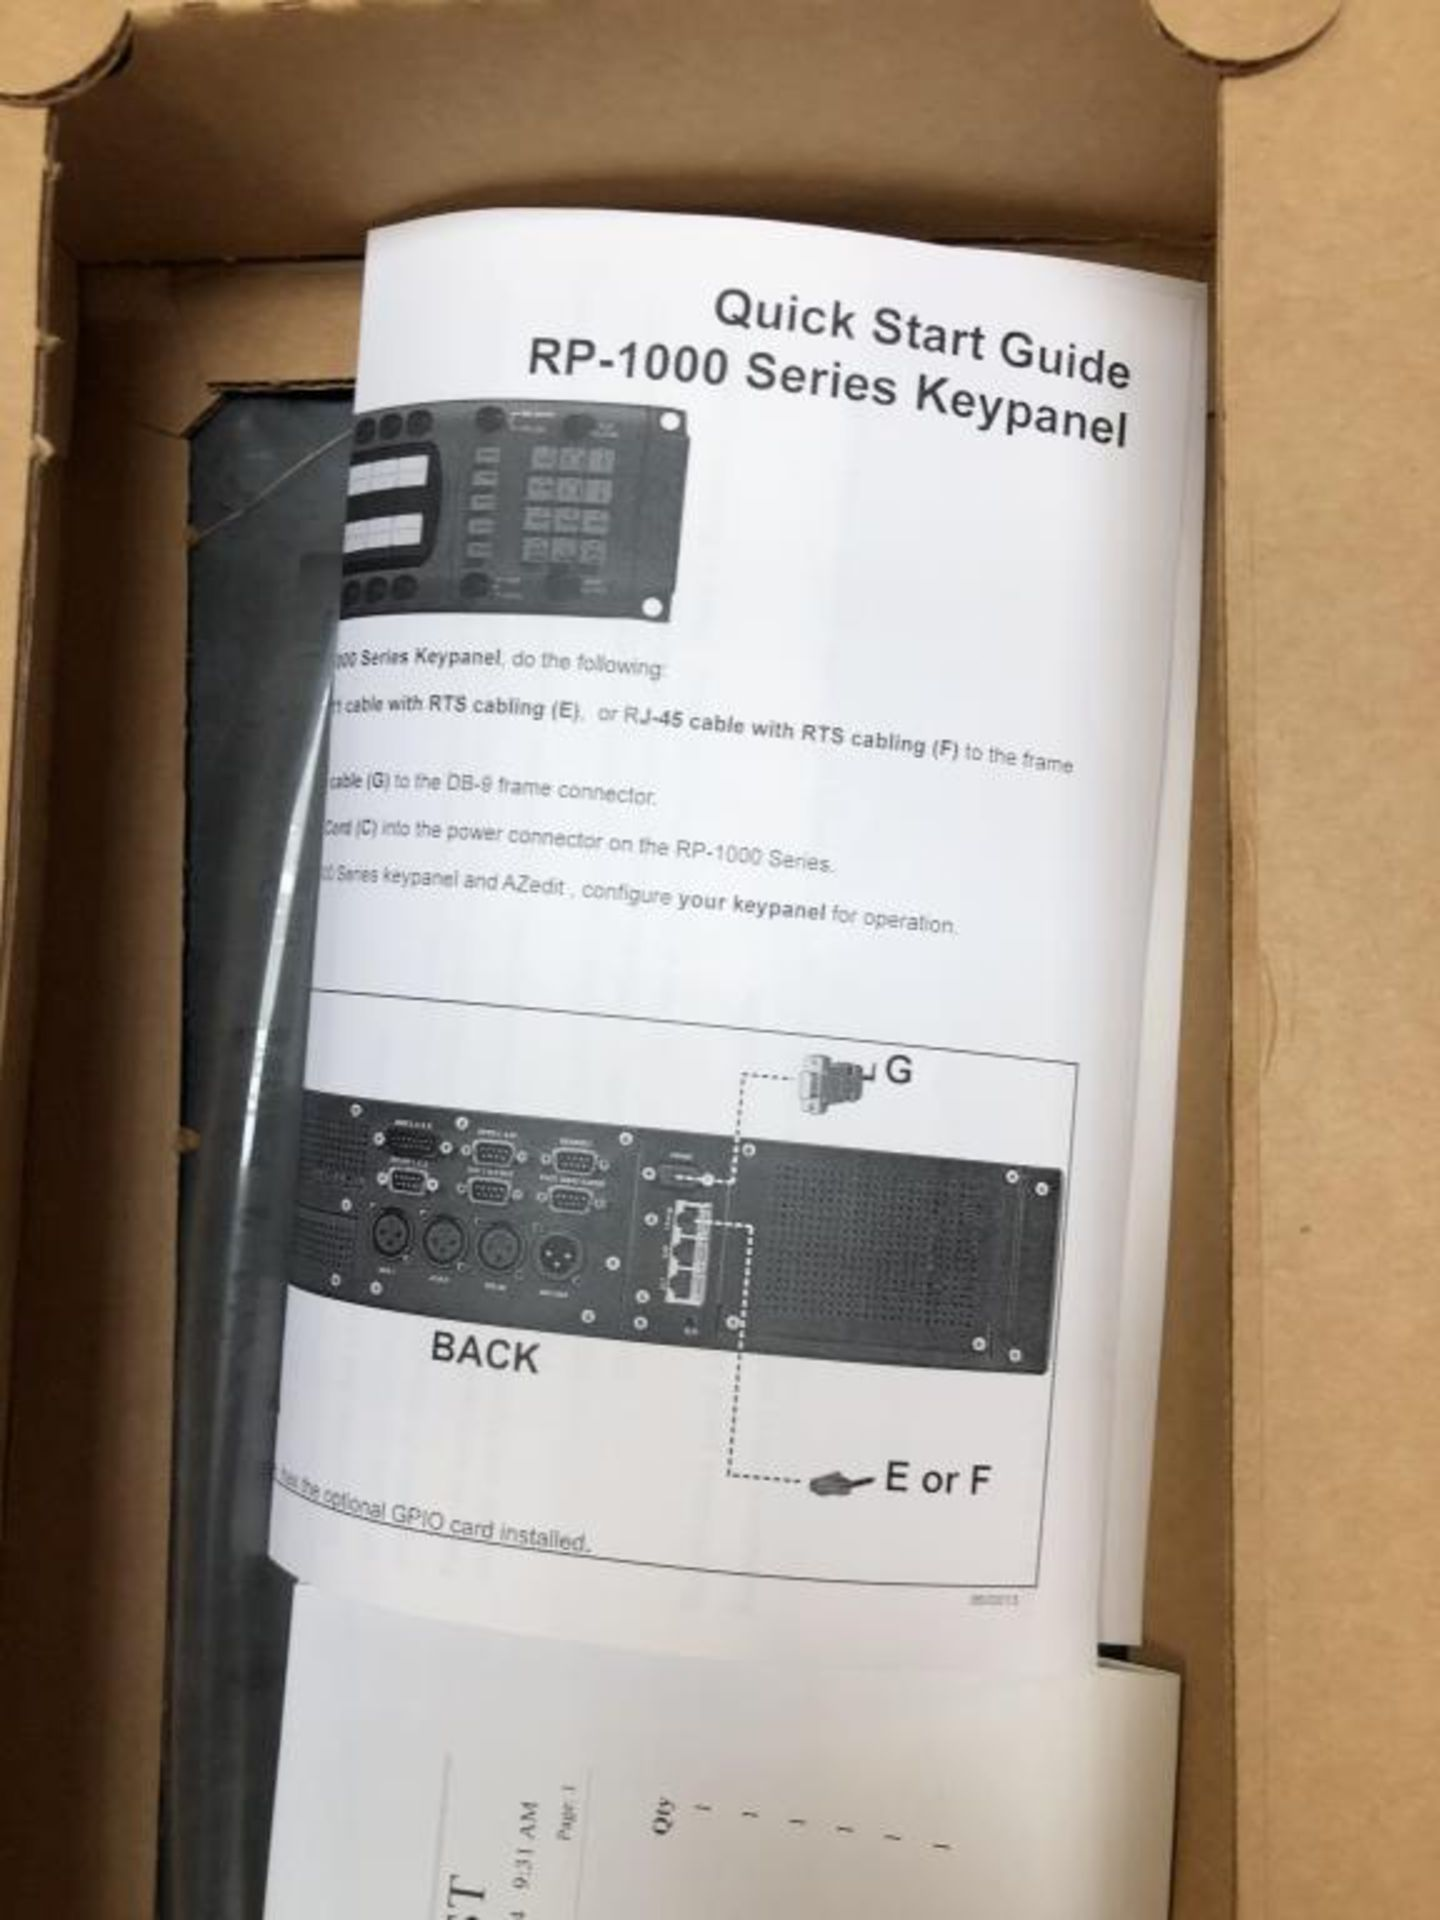 RP-1000 Series Keypanel - Image 7 of 11